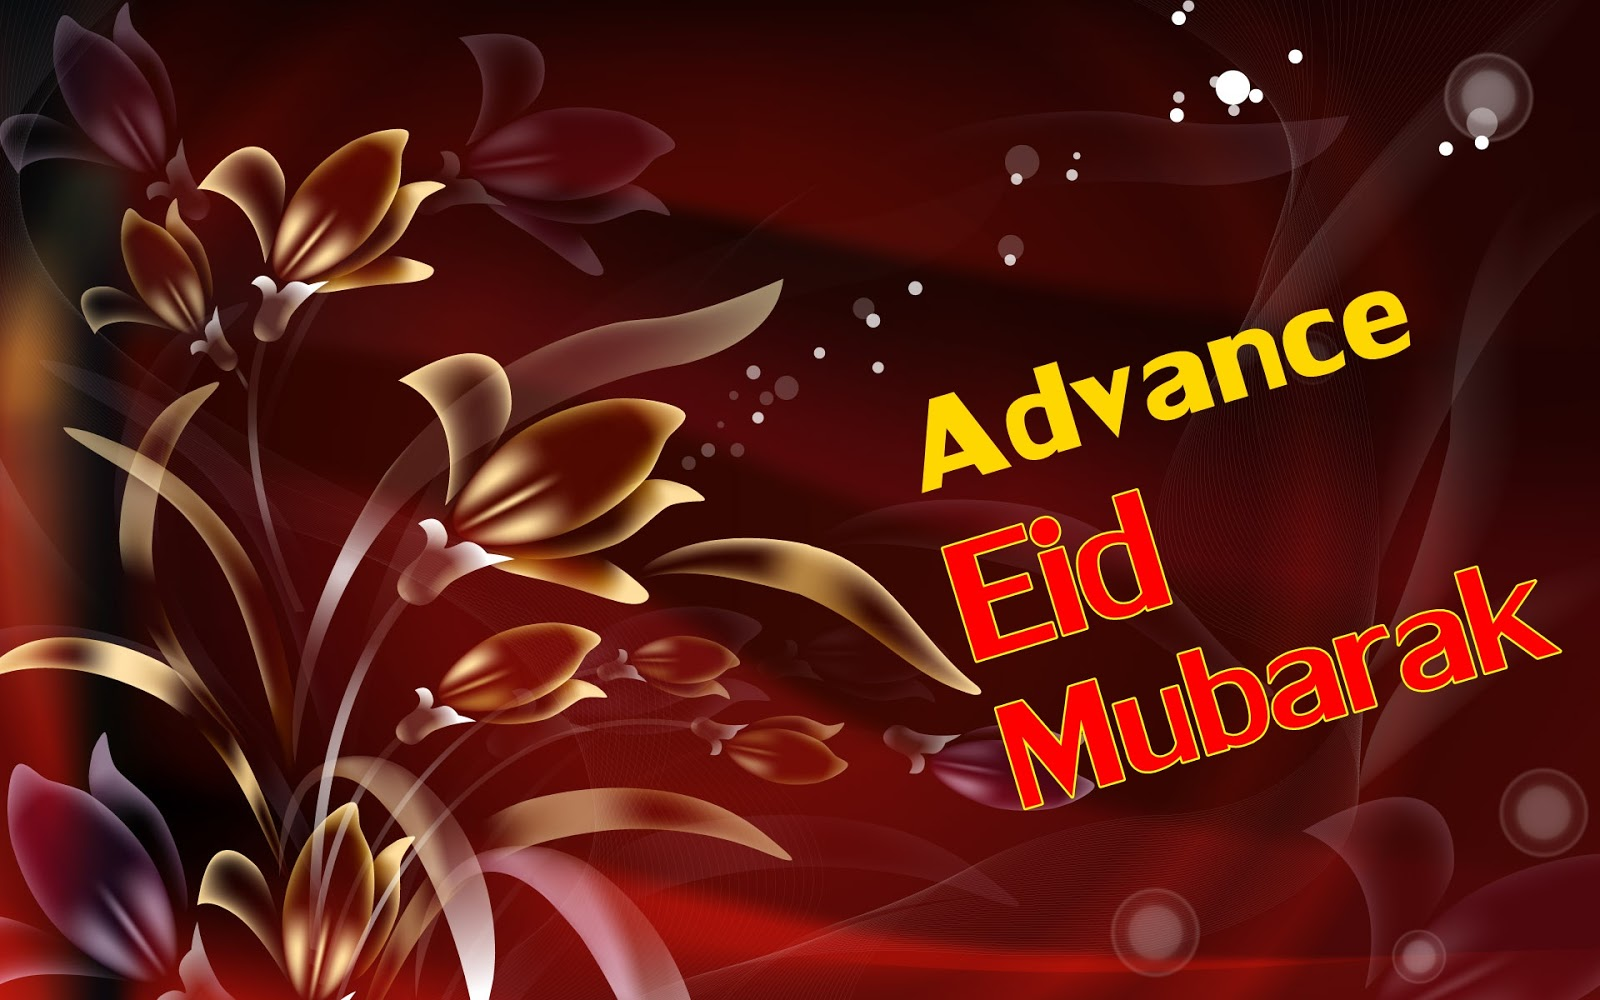 Popular Eod Eid Al-Fitr Greeting - c1f54bc40a30a7f8d31b7ee5b2dbf0ac  Image_418522 .jpg